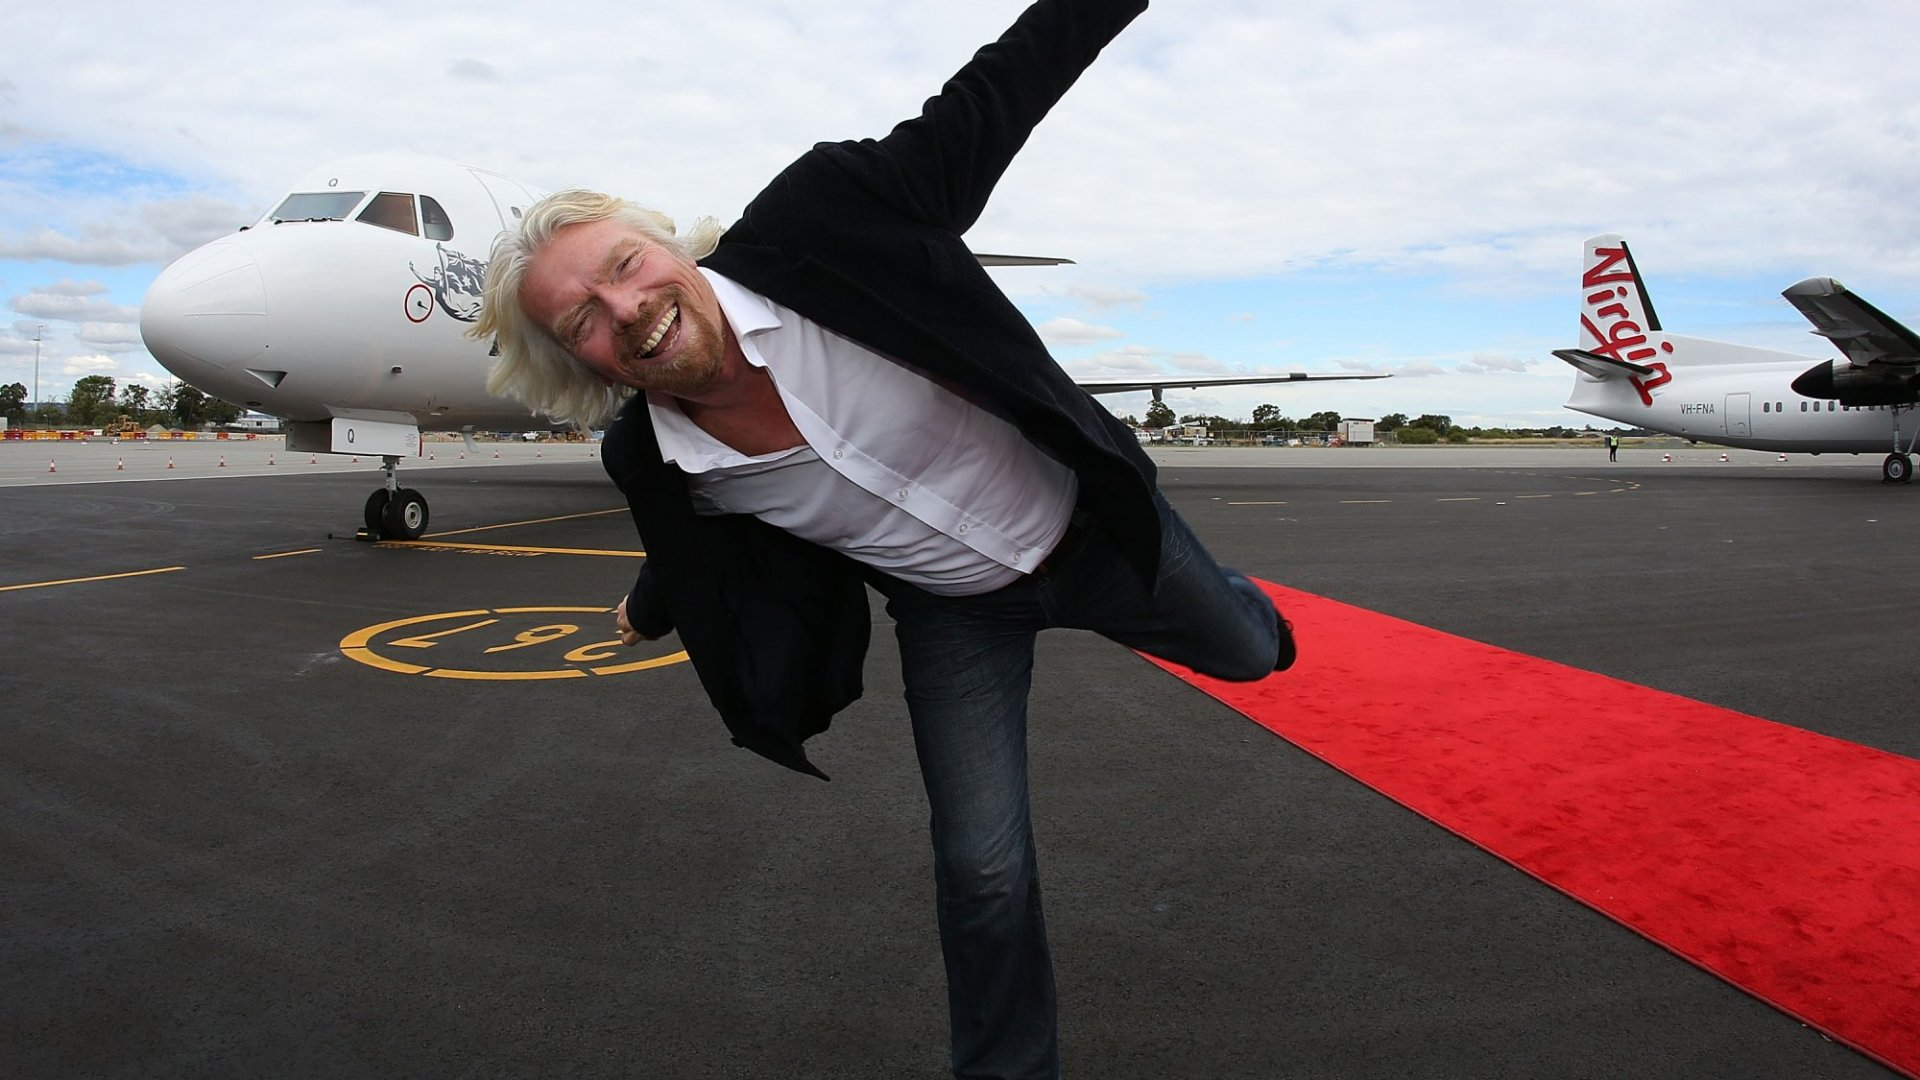 1 Children's Book Richard Branson Says Changed His Life